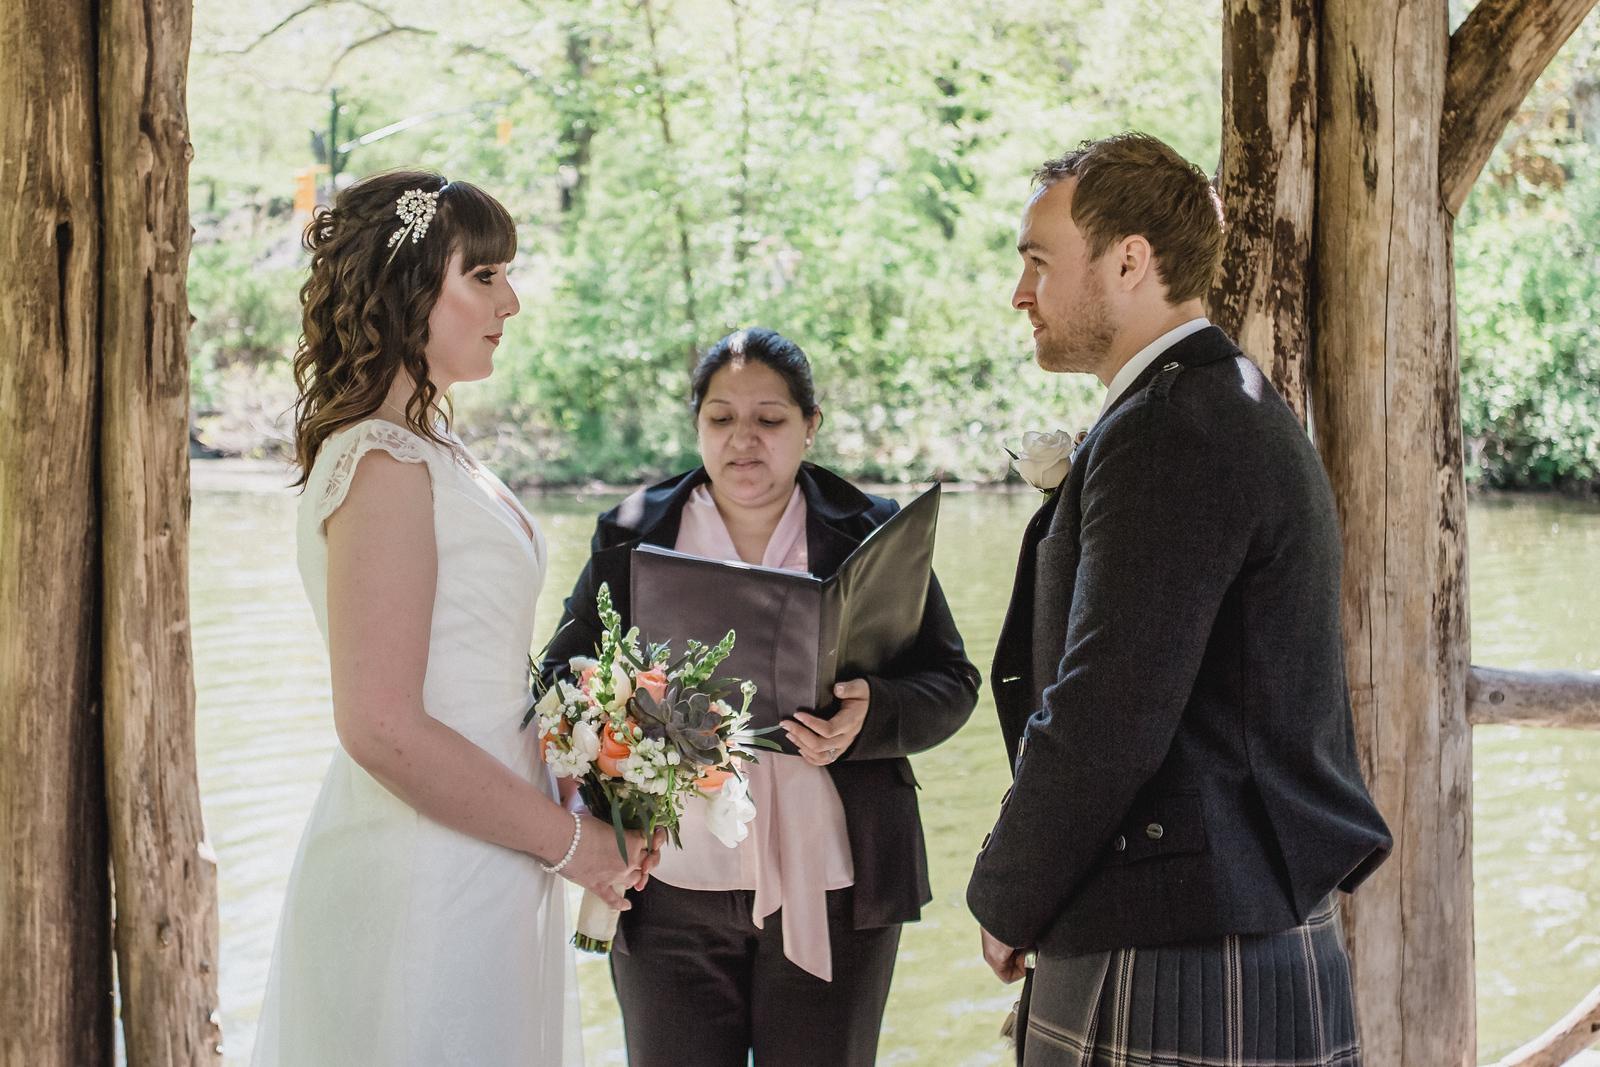 Central Park Wedding - Gary & Kirsty-4